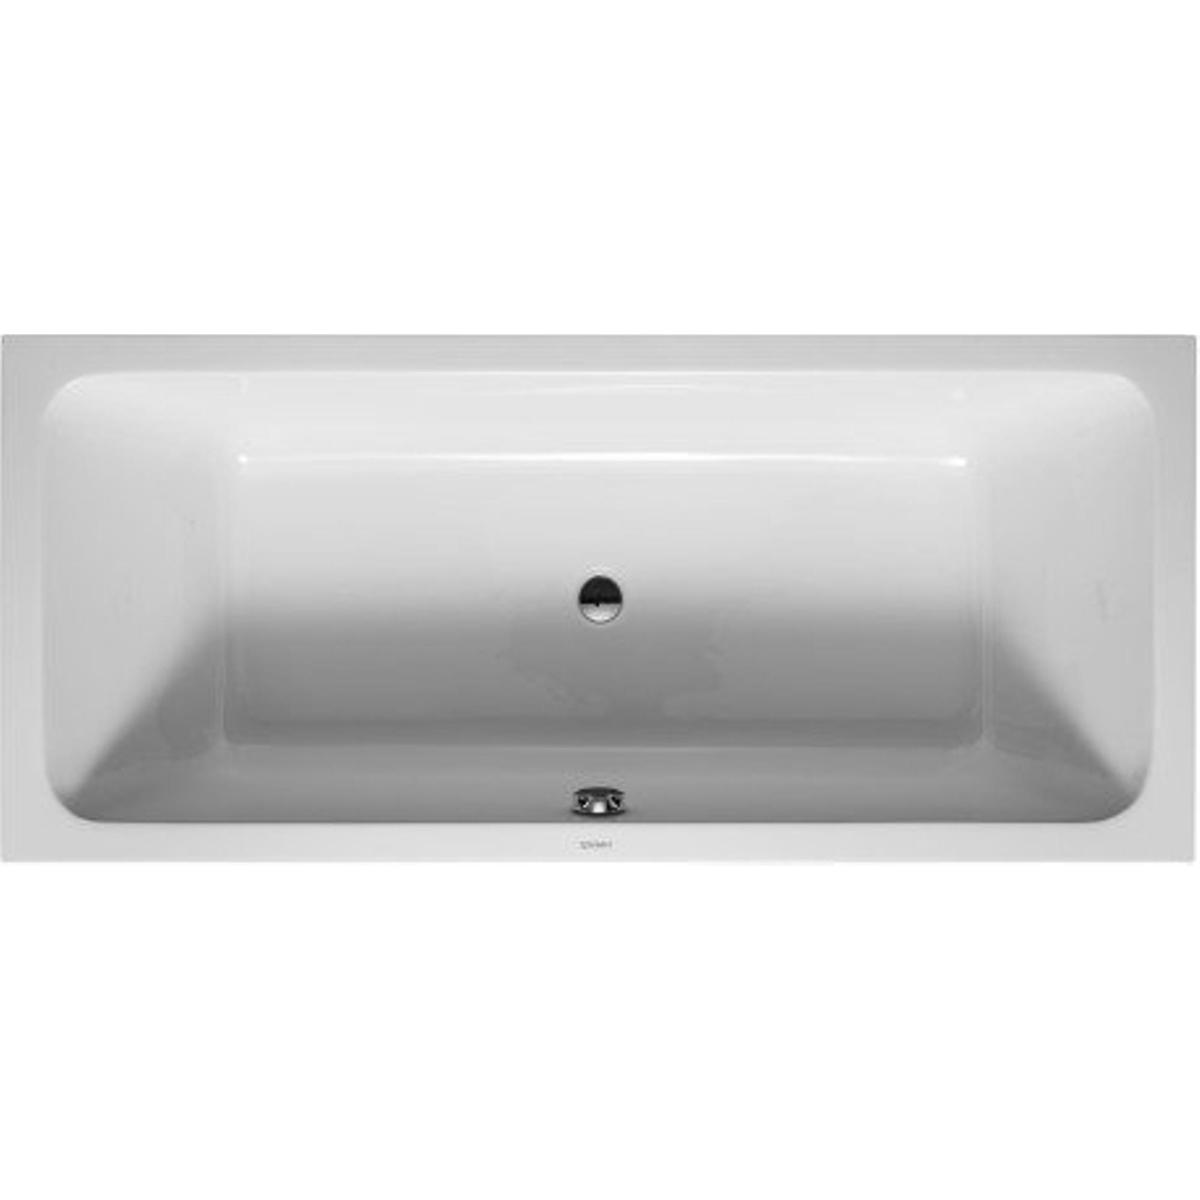 duravit d code baignoire duo rectangulaire 180x80x40cm blanc 0297516